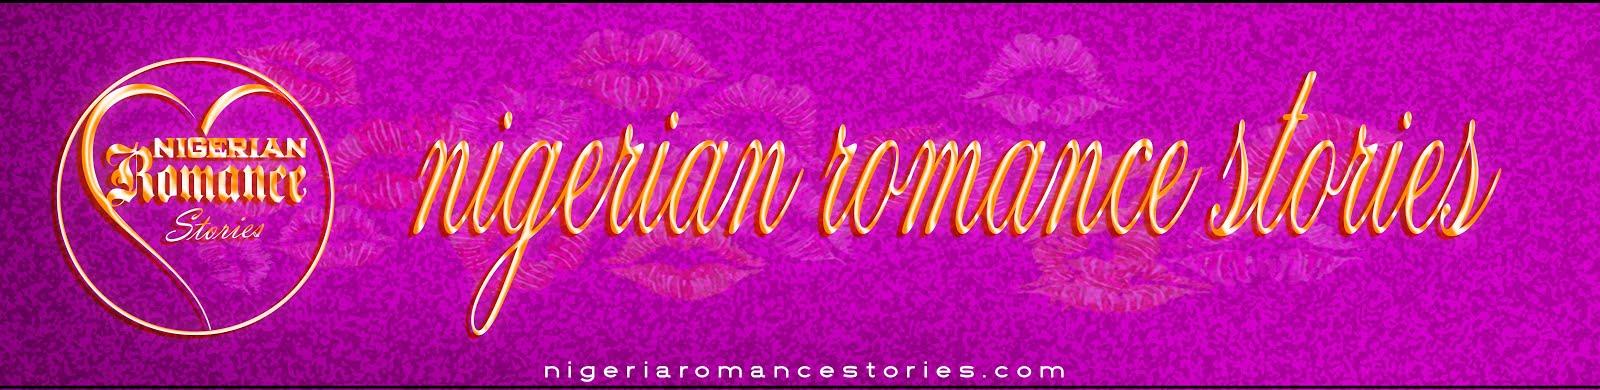 Nigerian Romance Stories